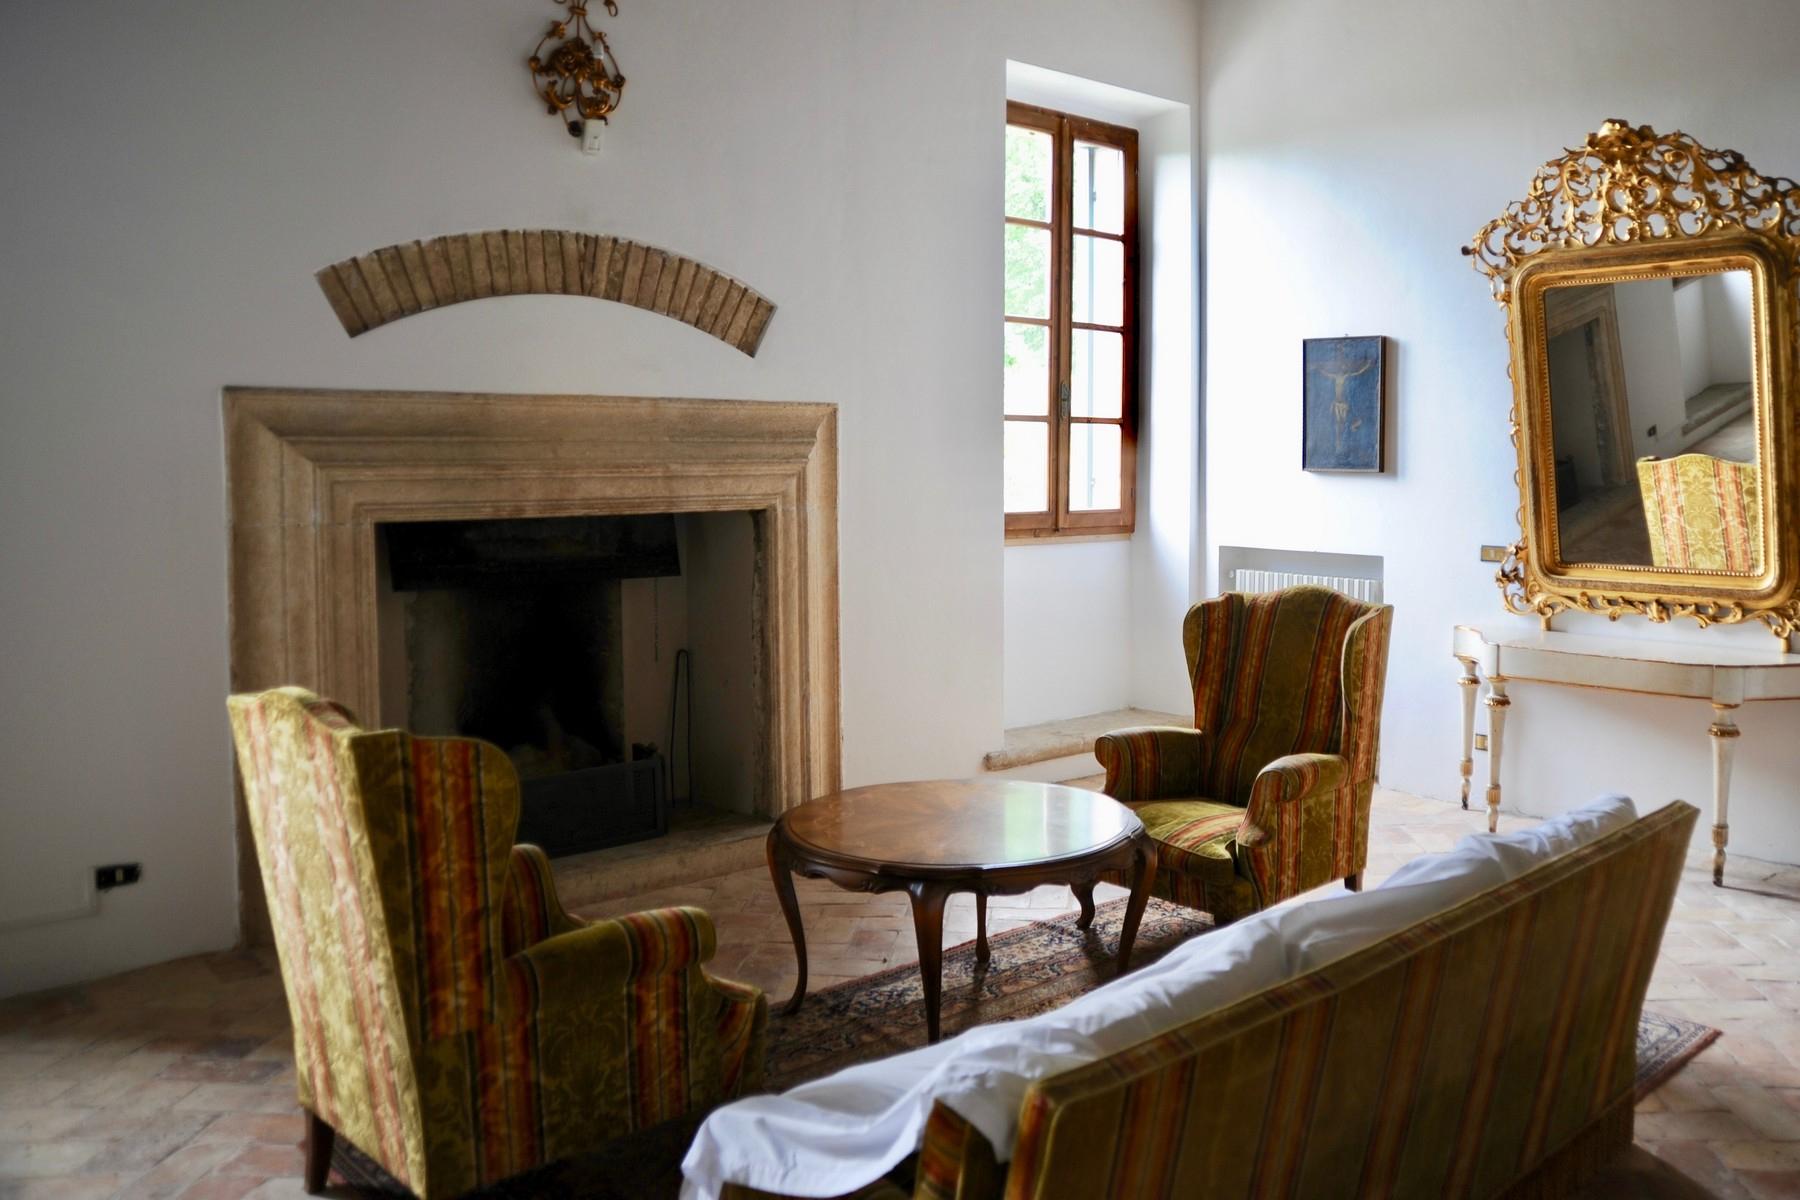 Villa in Vendita a Verona: 5 locali, 450 mq - Foto 4